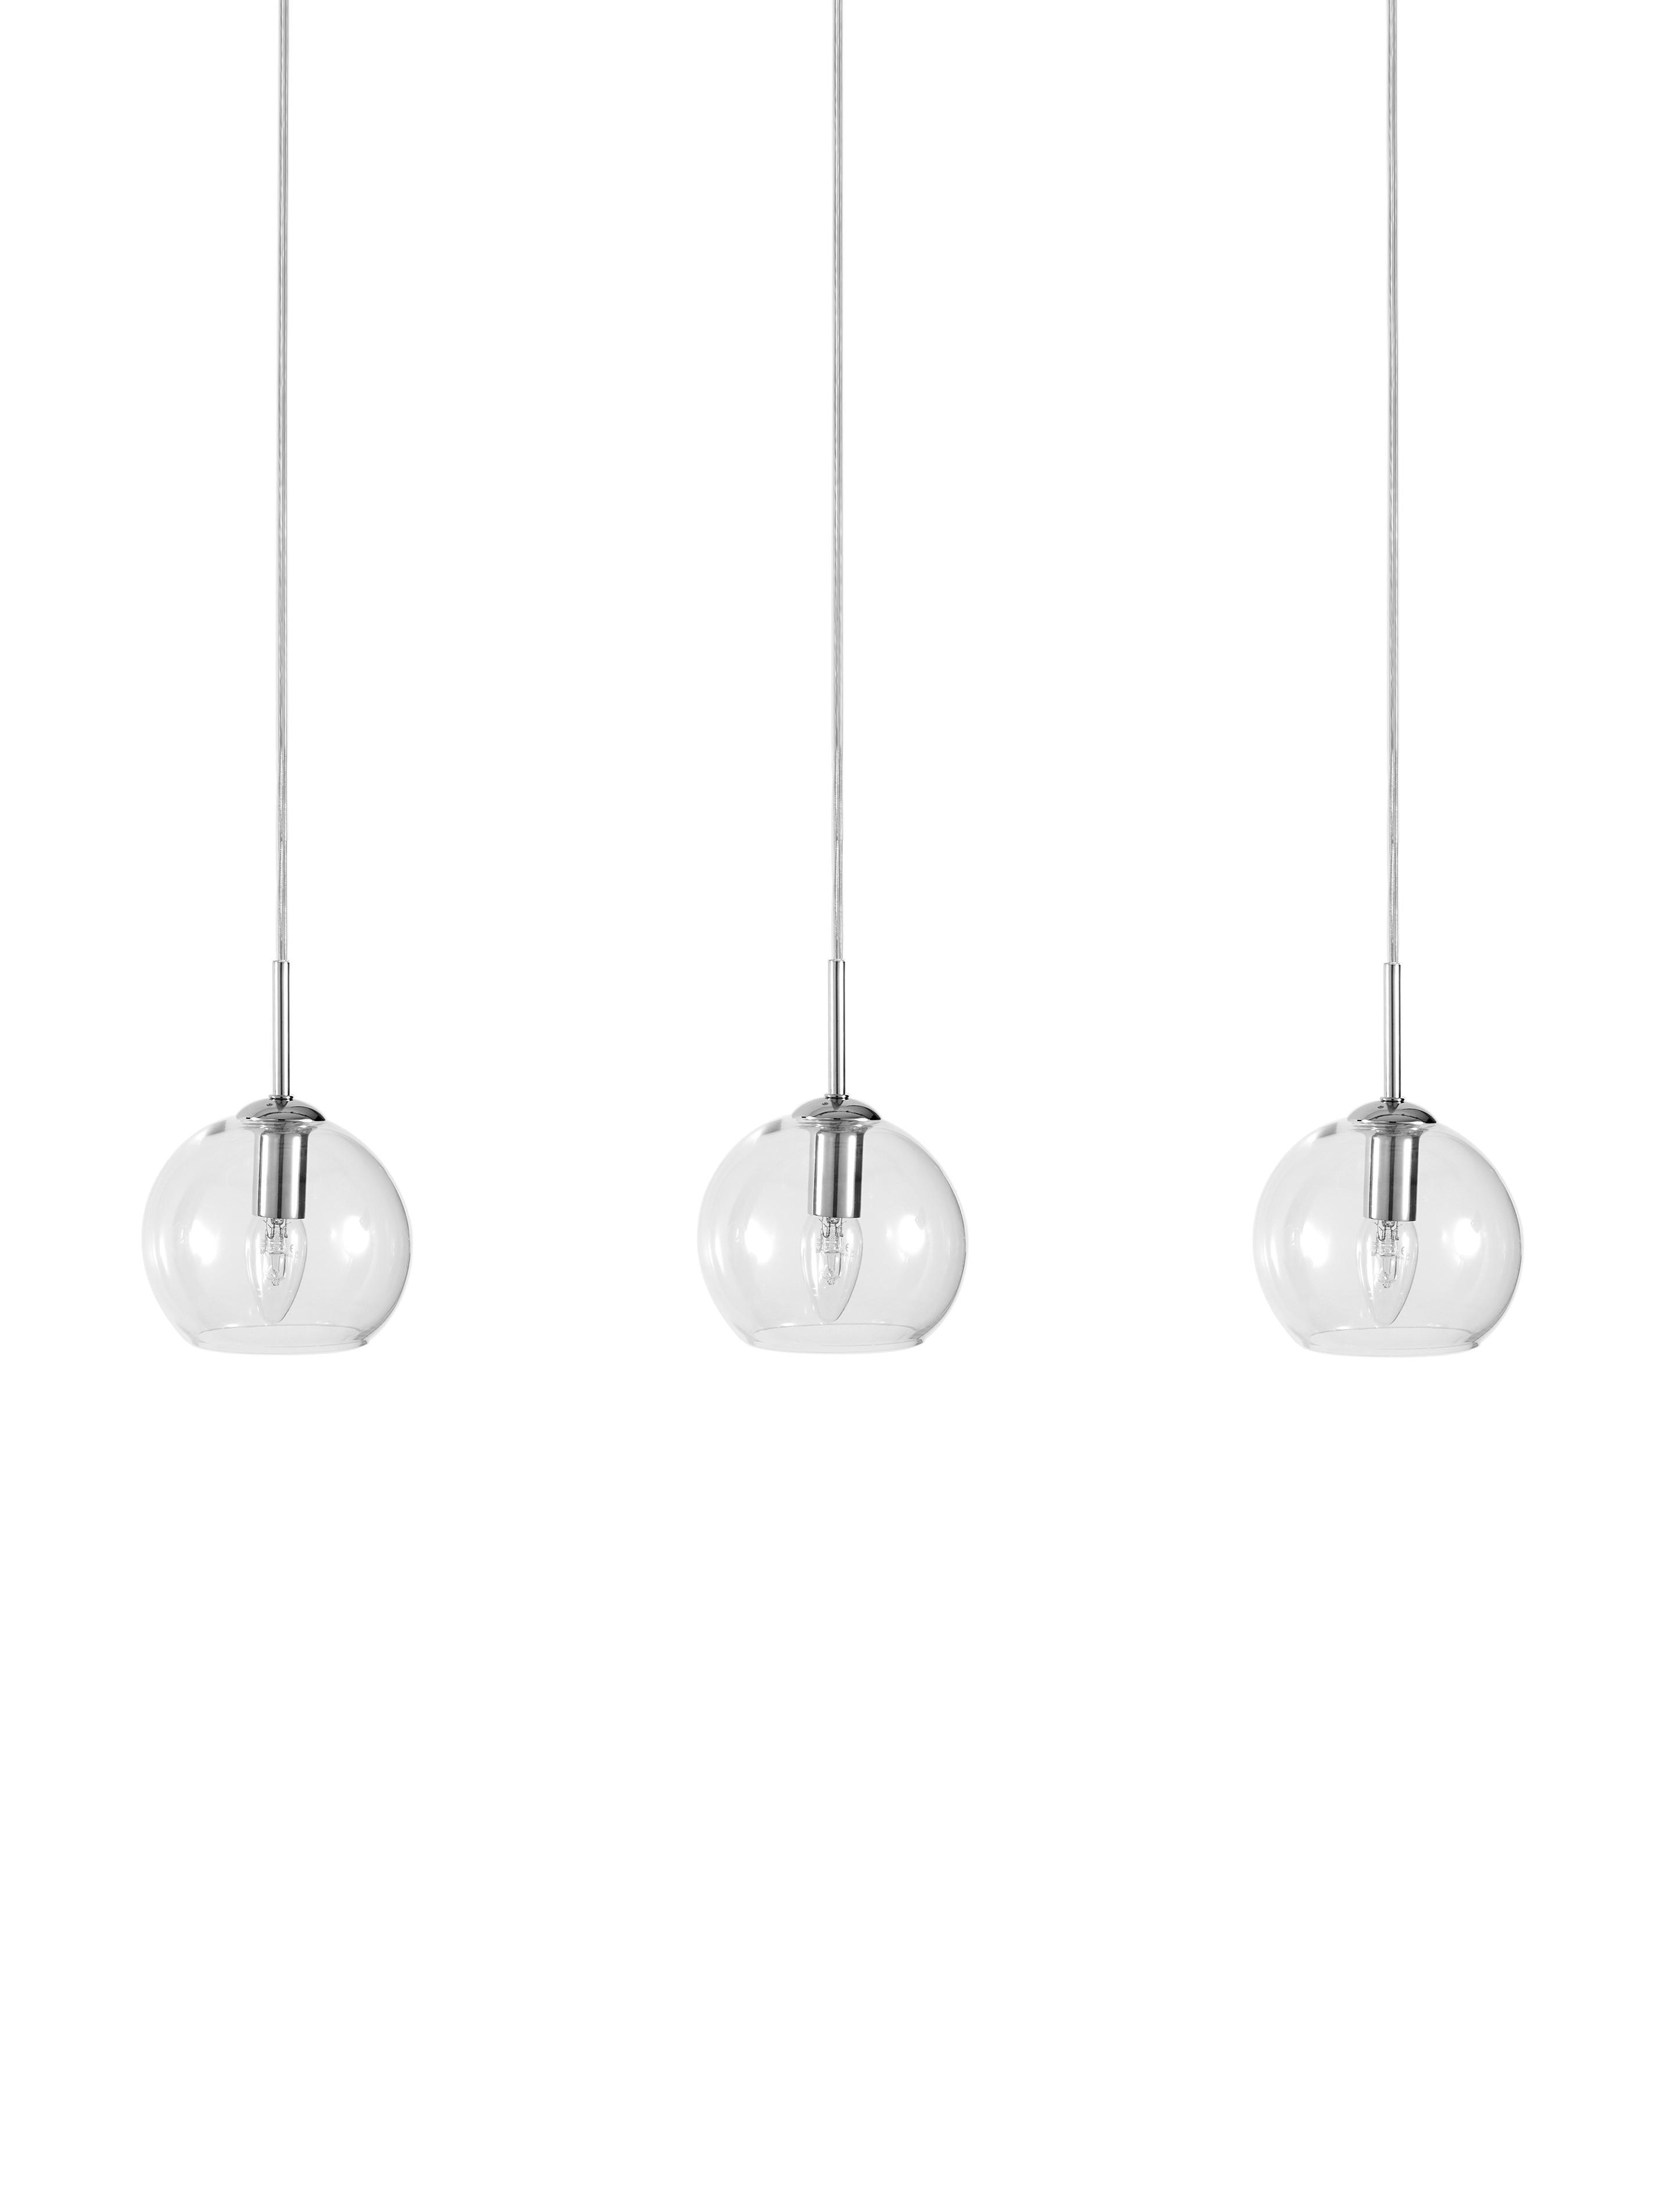 Pendelleuchte Hamilton in Silber, Gestell: Metall, verchromt, Baldachin: Metall, verchromt, Transparent, B 81 x T 15 cm